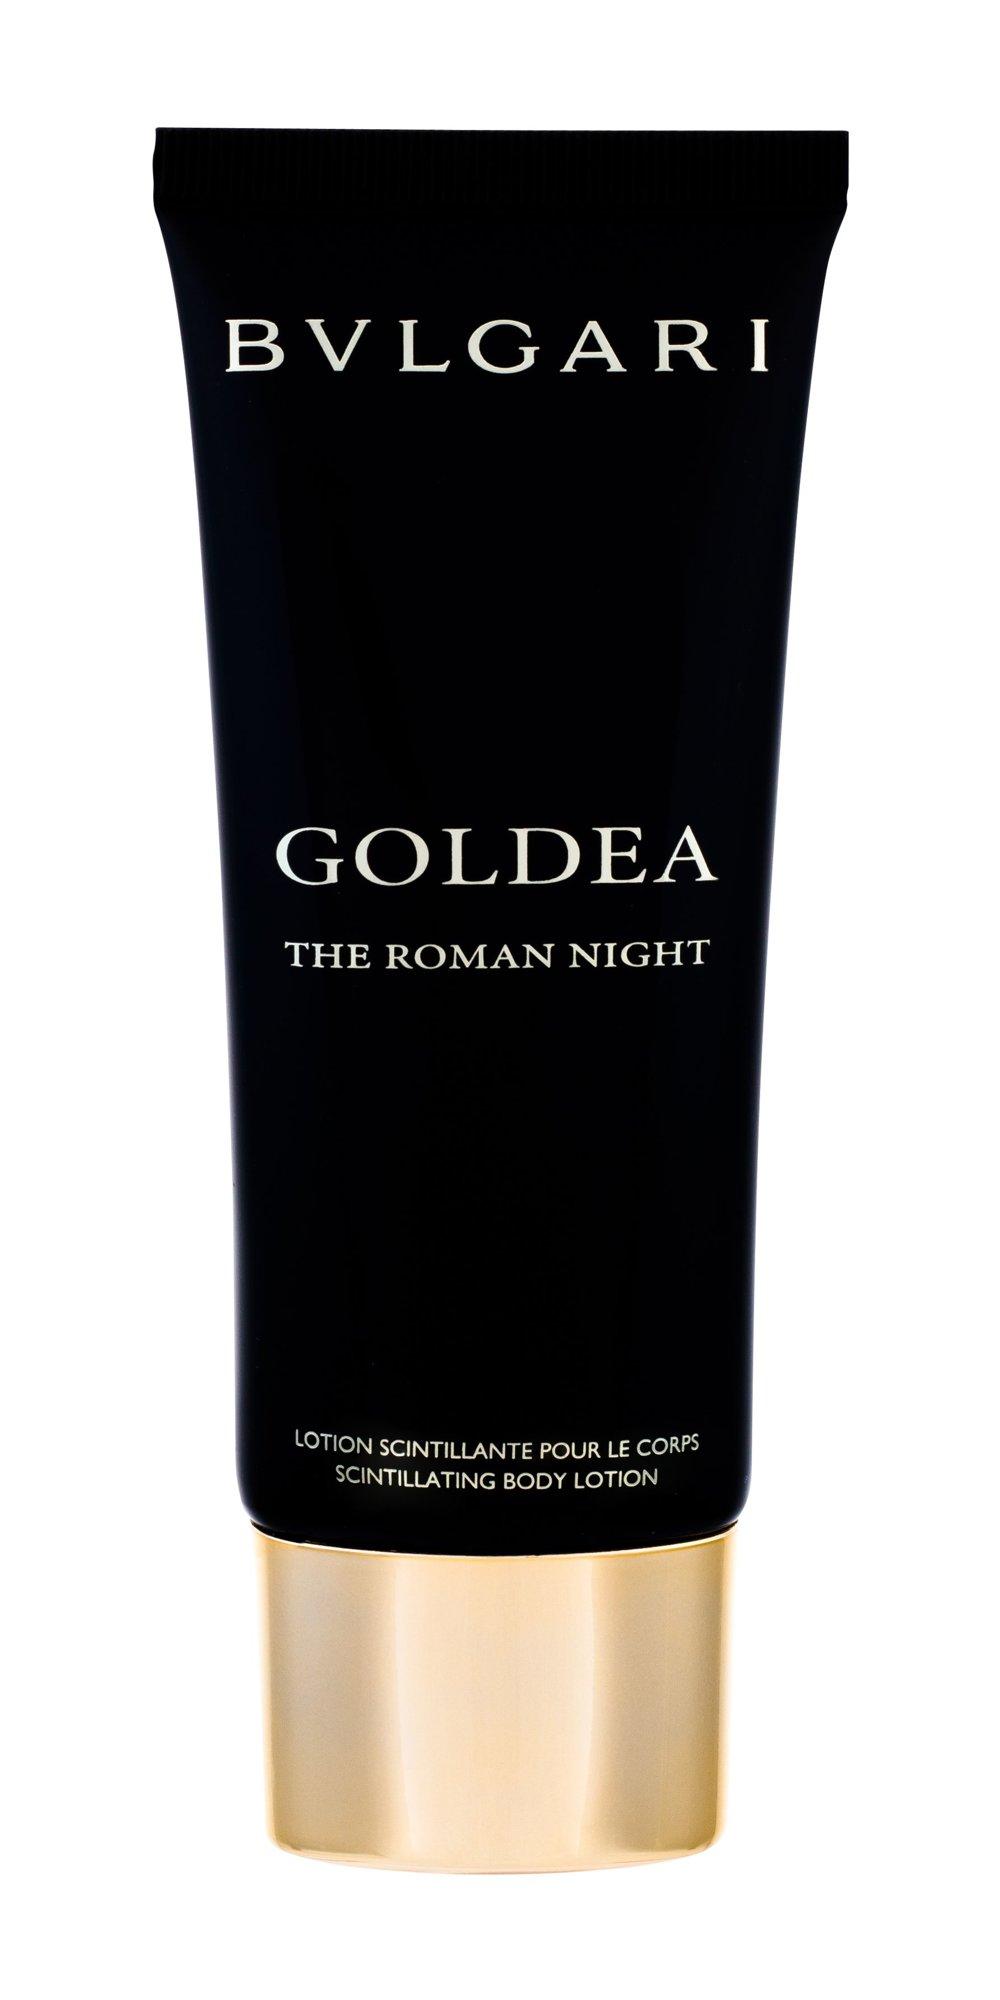 Bvlgari Goldea The Roman Night Body lotion 100ml